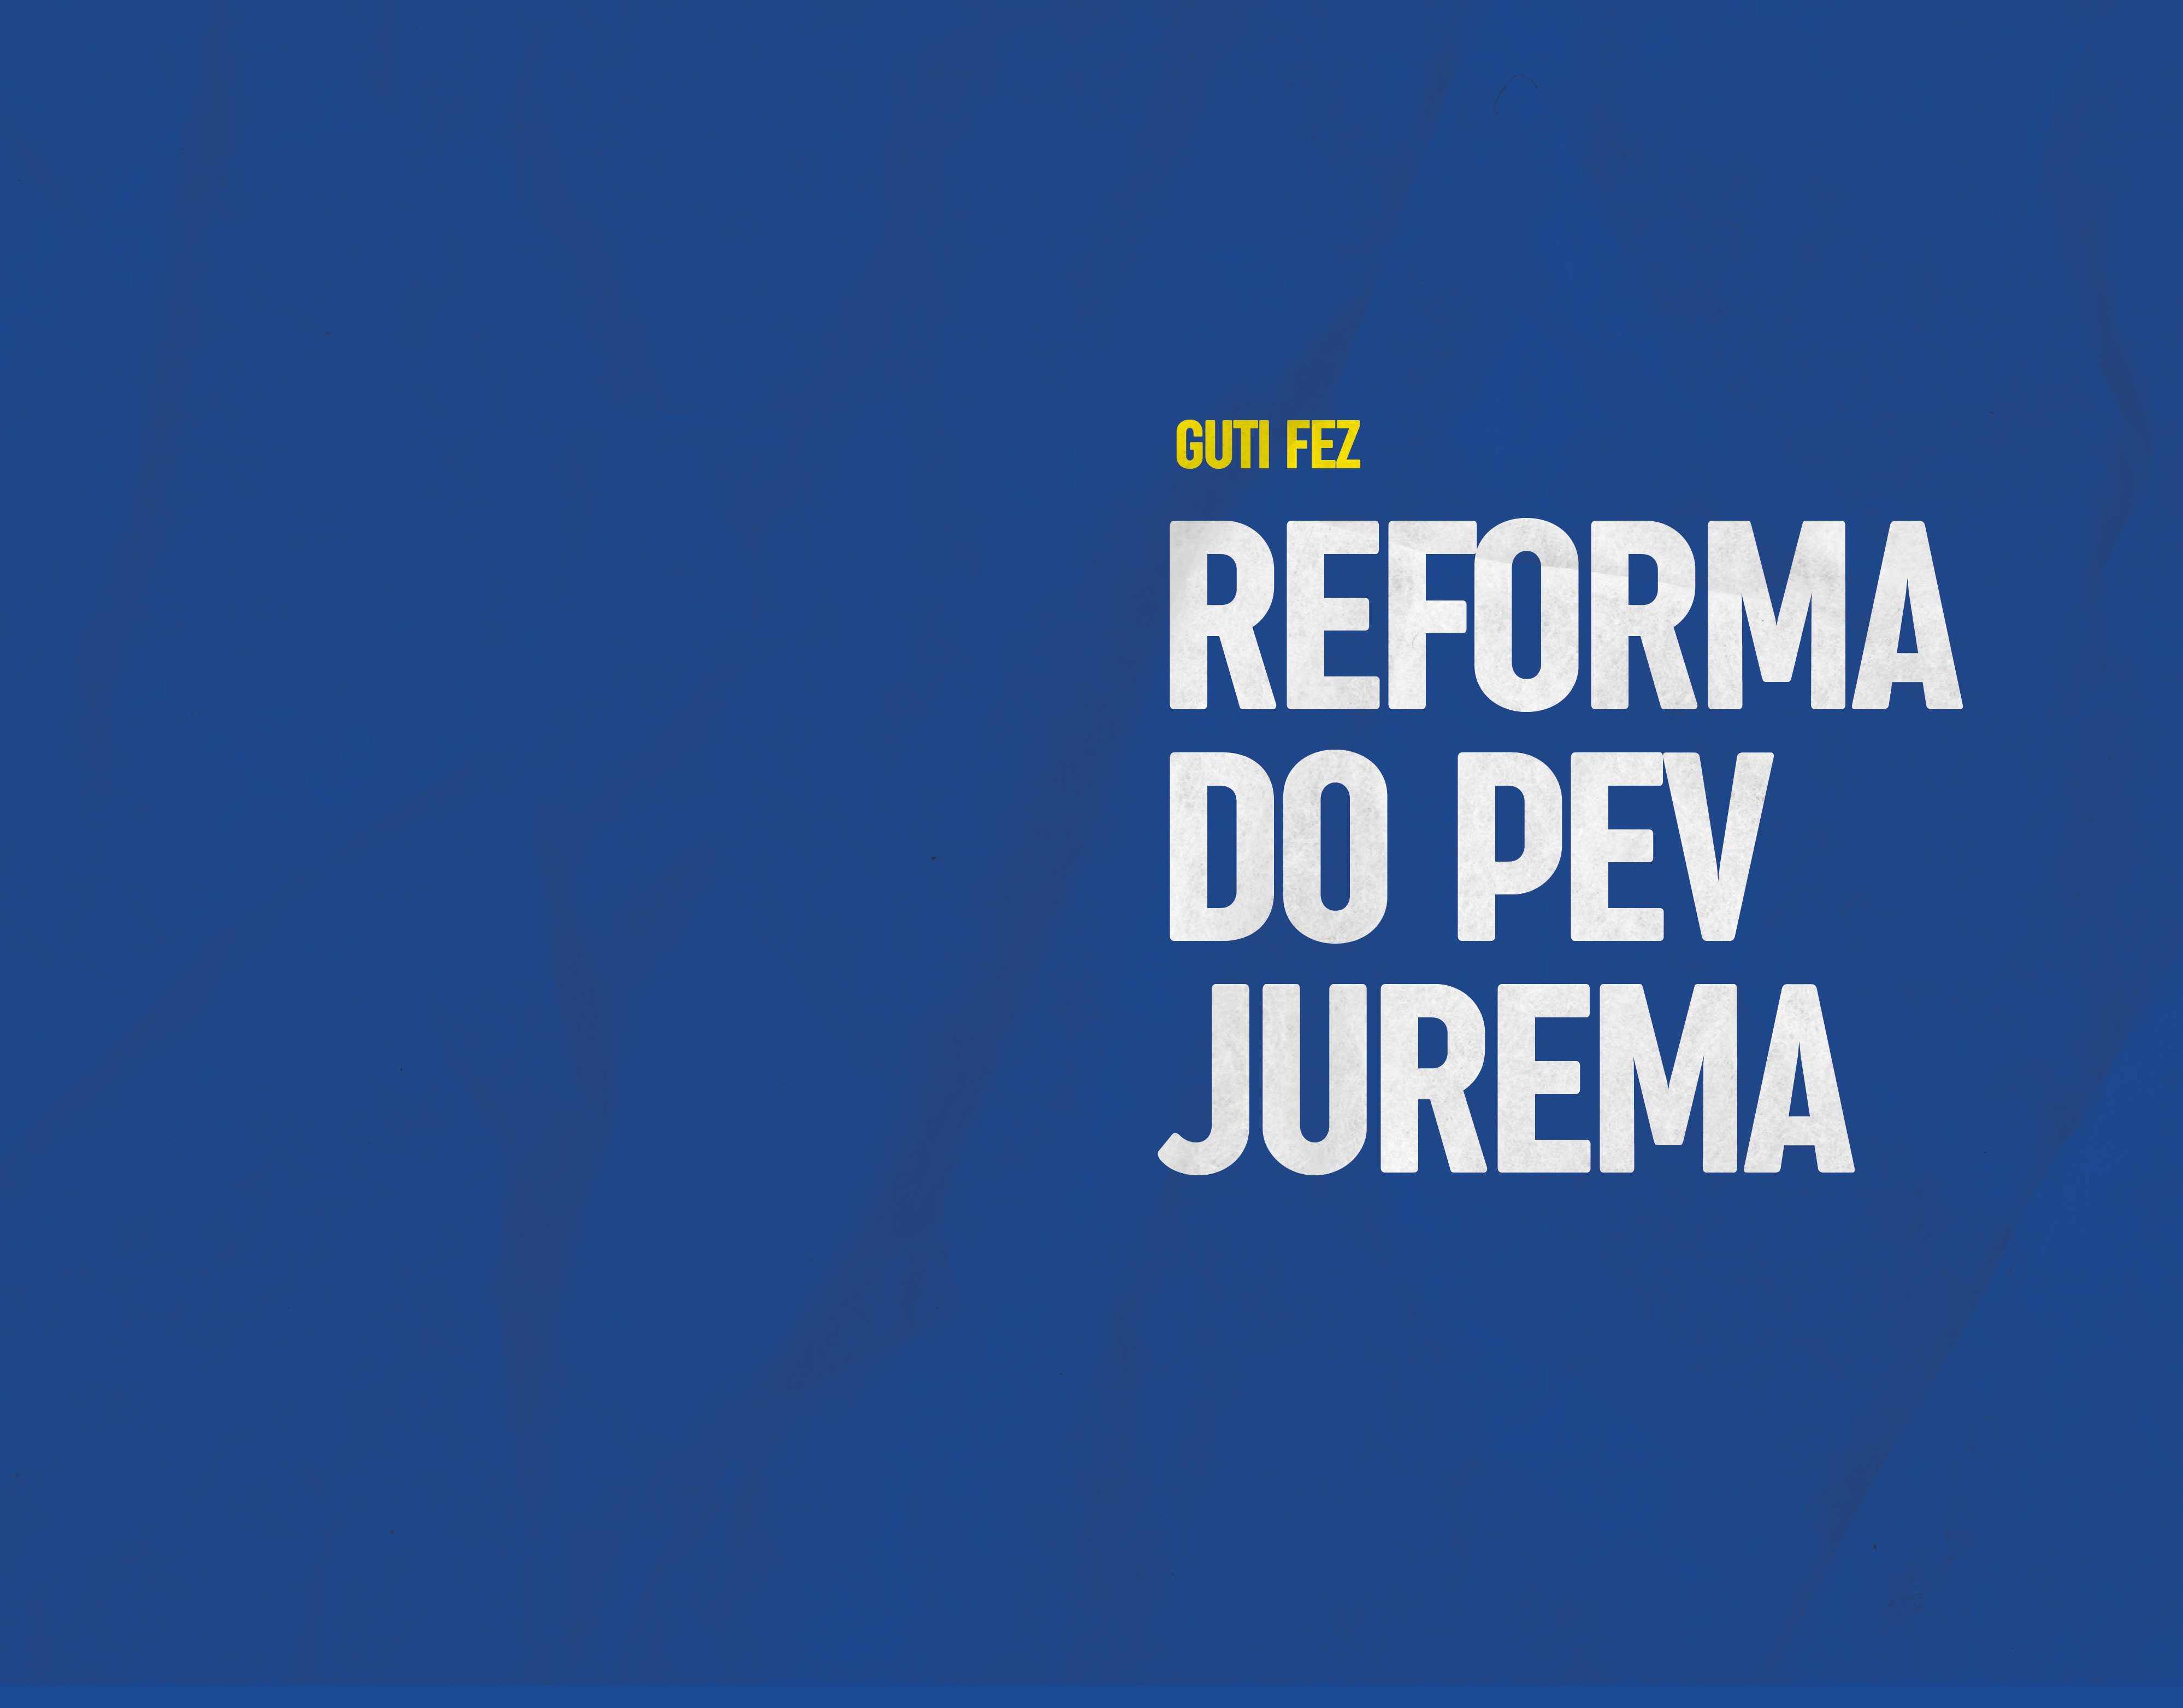 Reforma do PEV Jurema